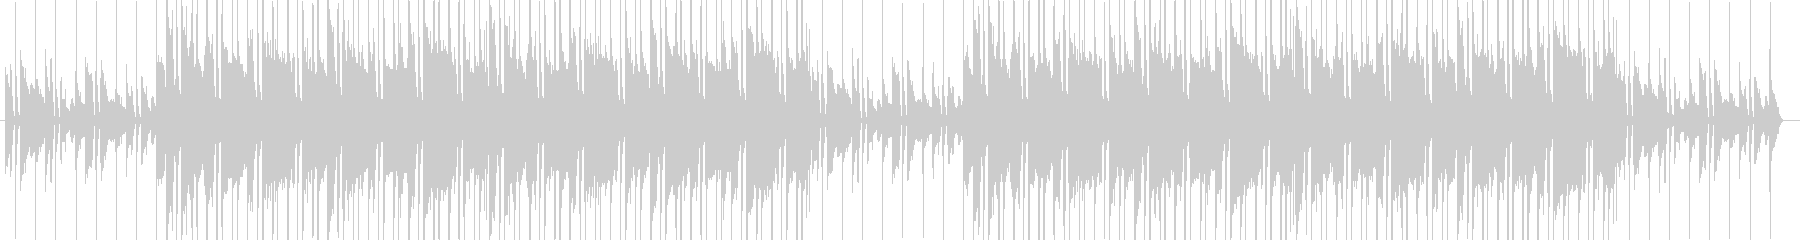 Break Pianoの未再生の波形